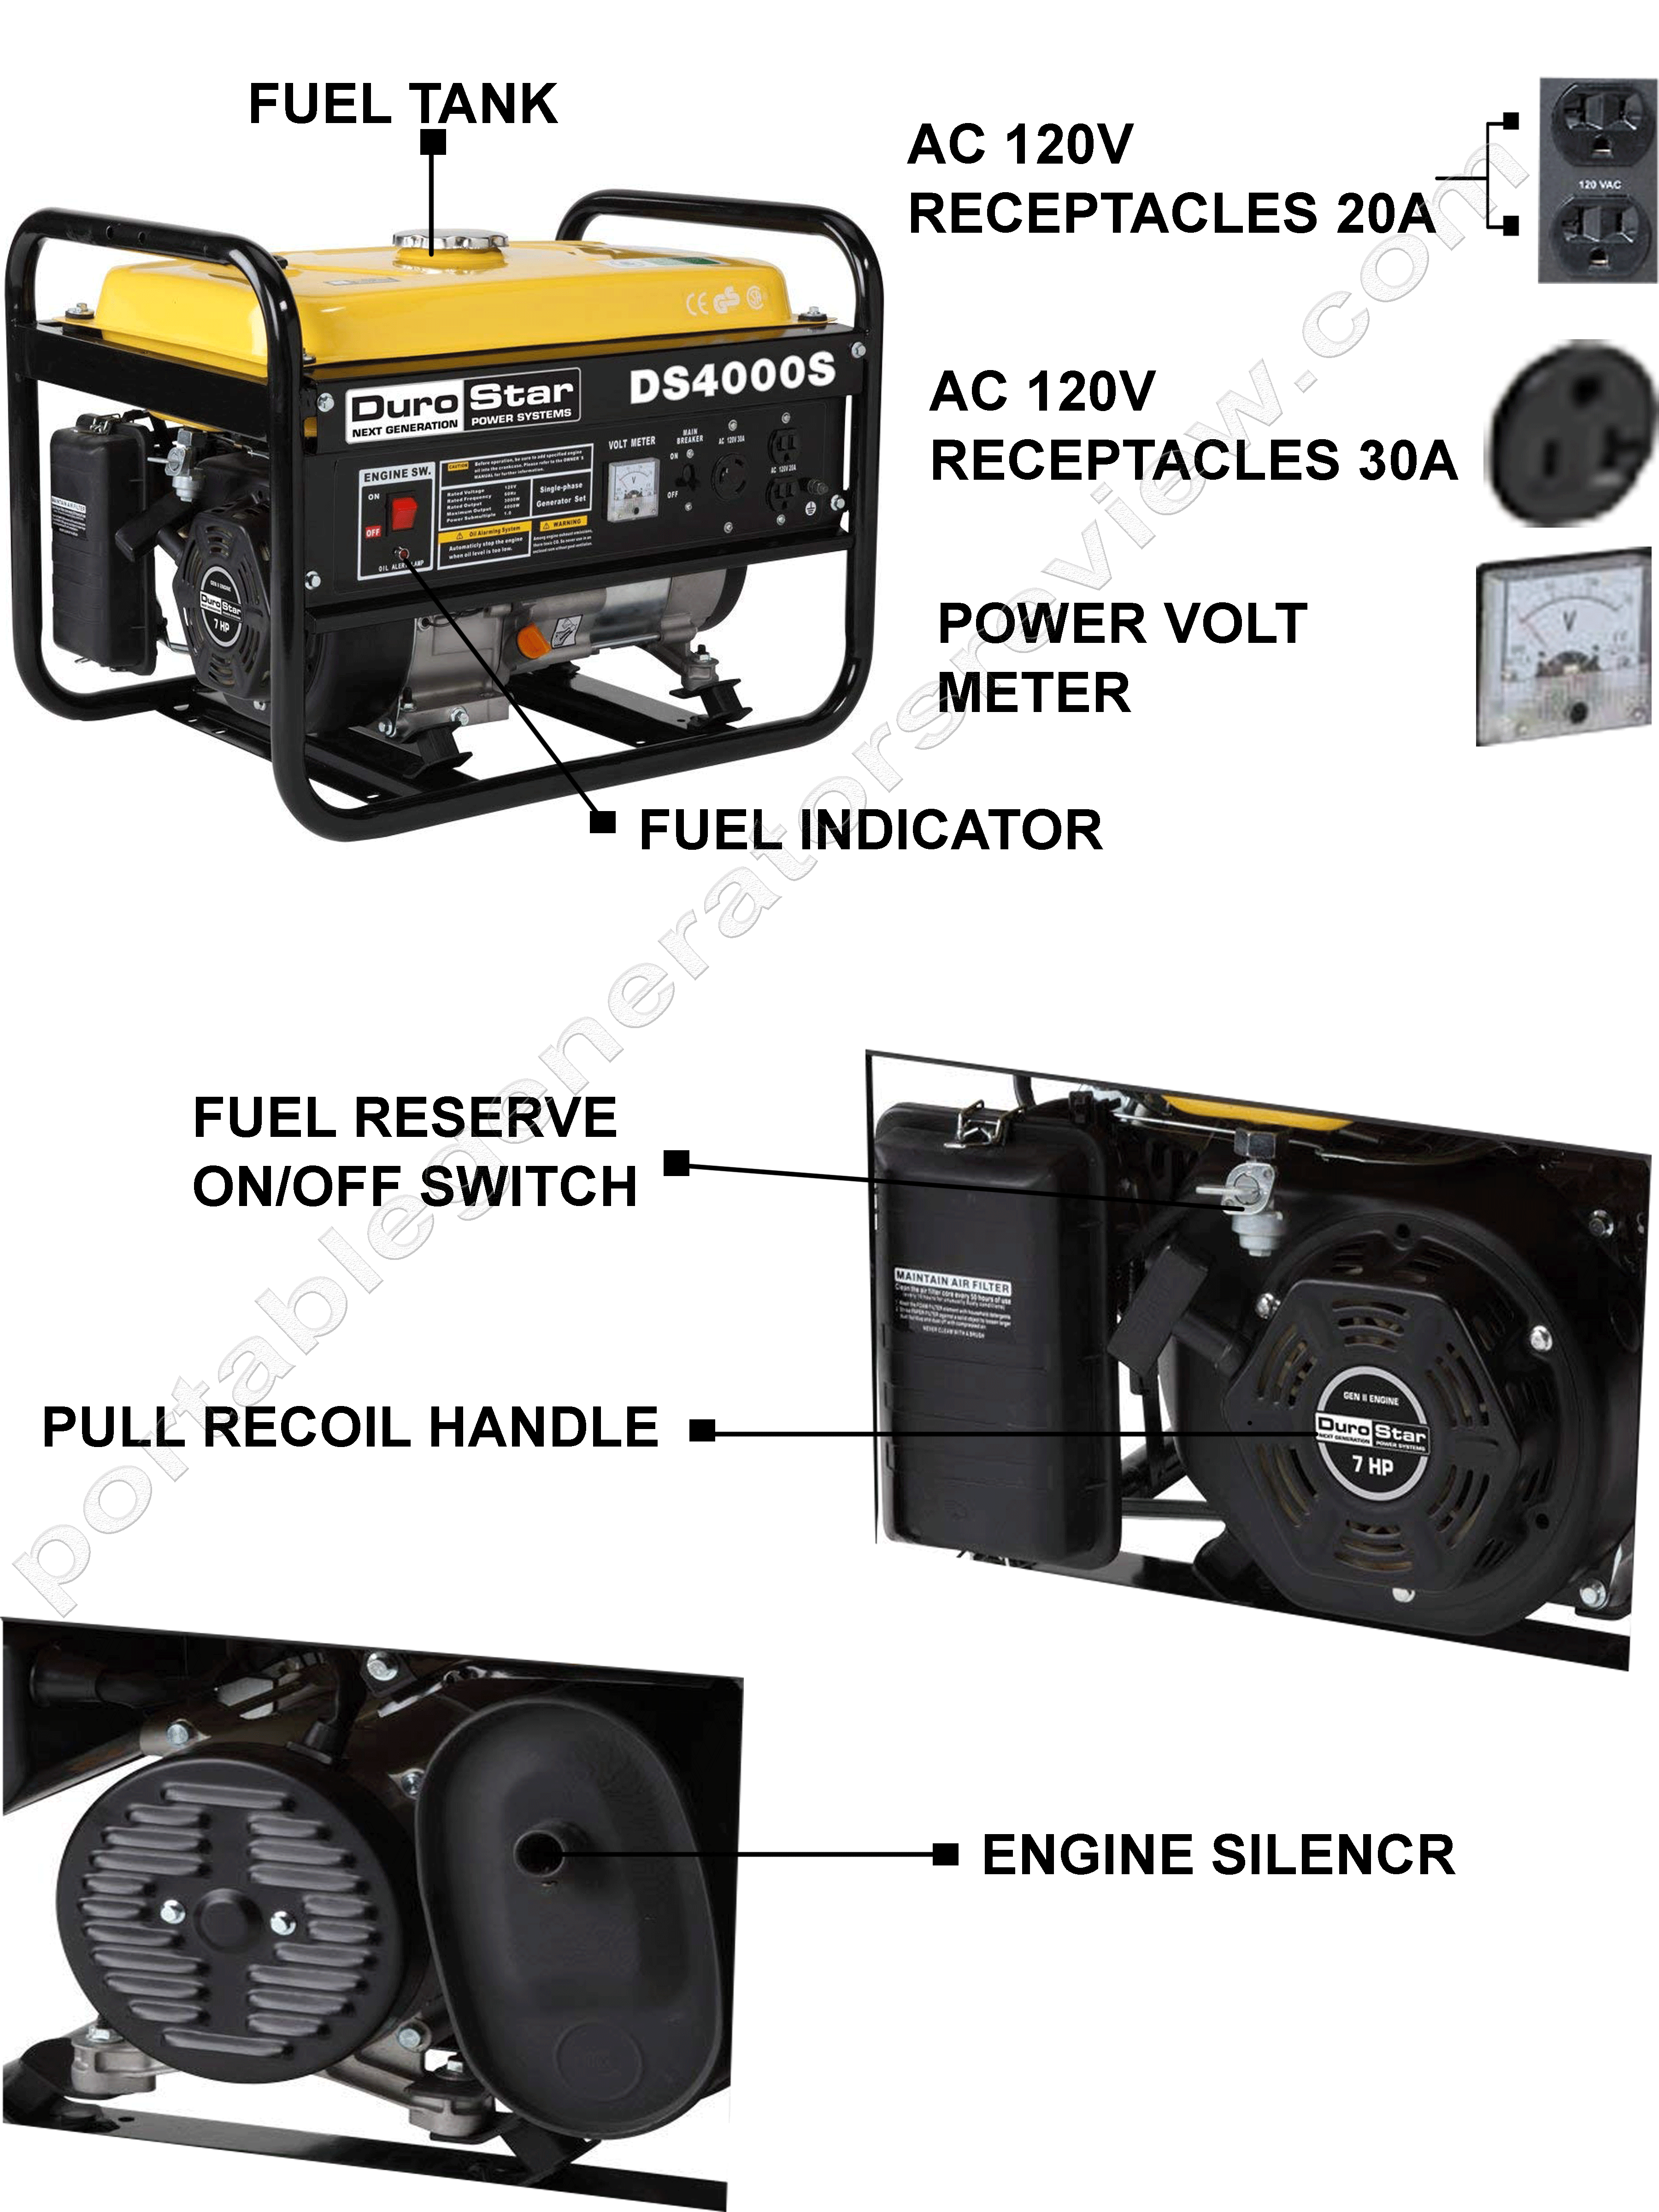 Durostar_DS4000S_Generator